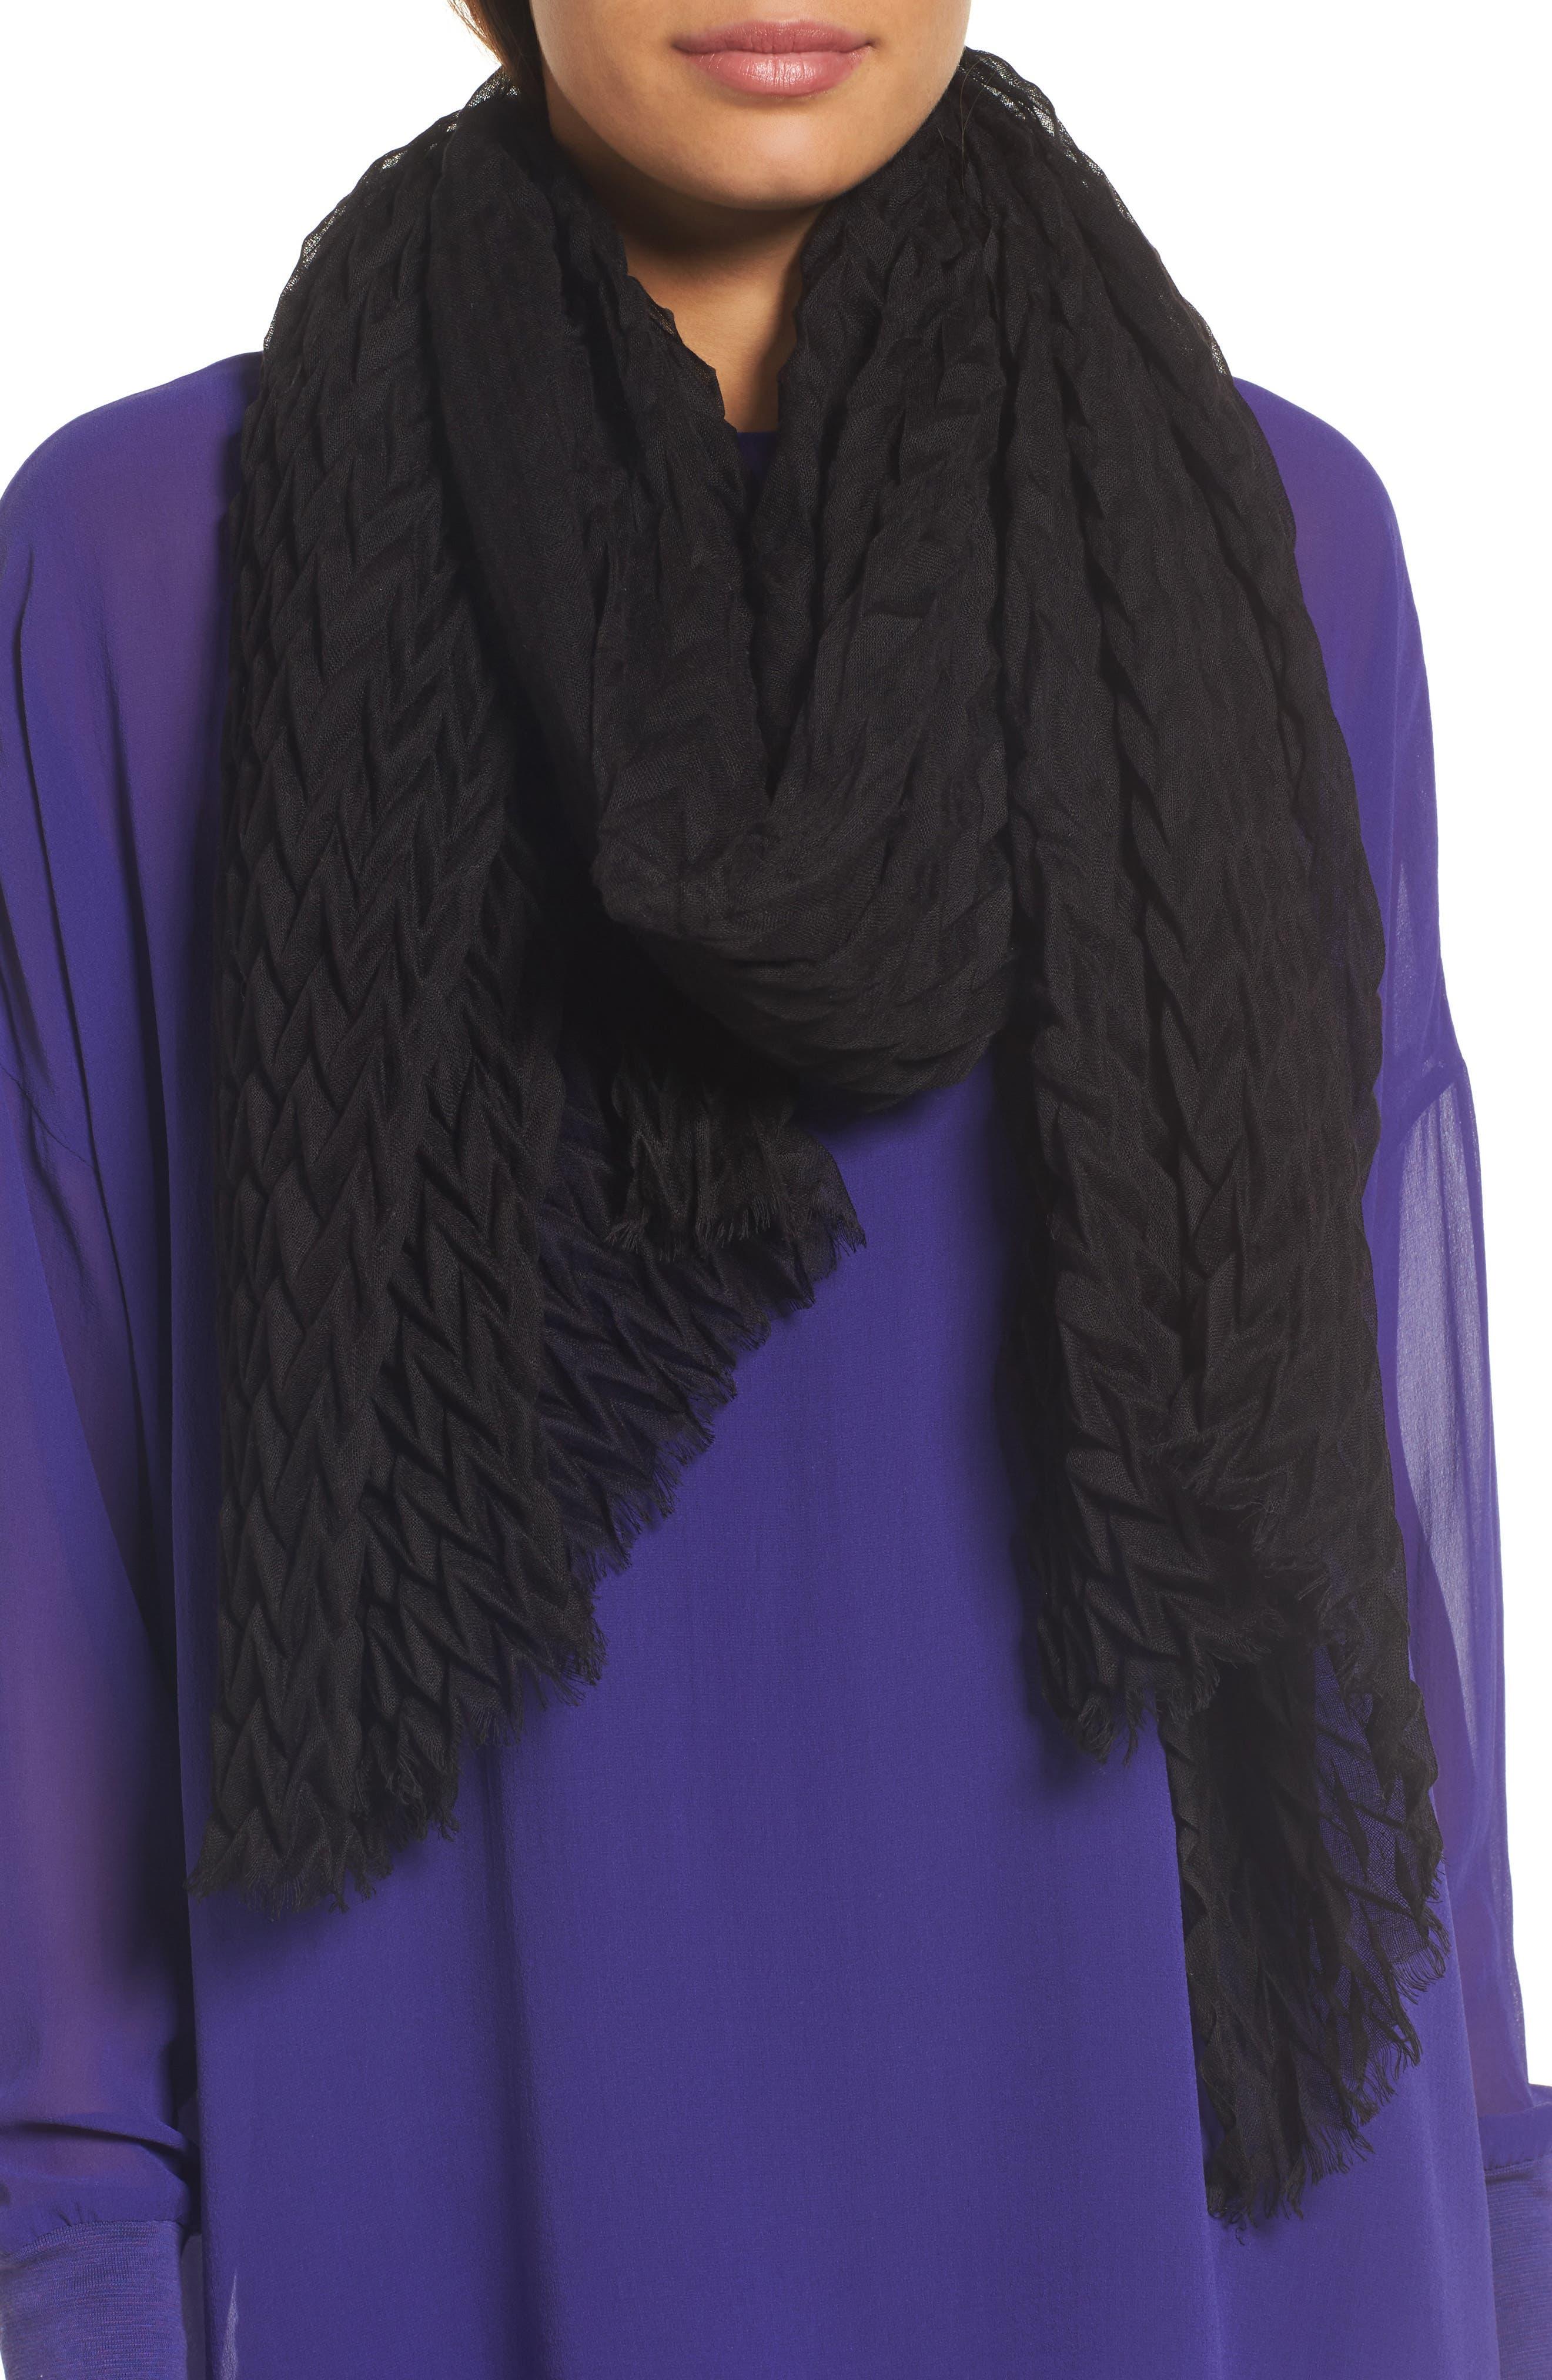 Silk & Wool Wrap,                             Main thumbnail 1, color,                             001